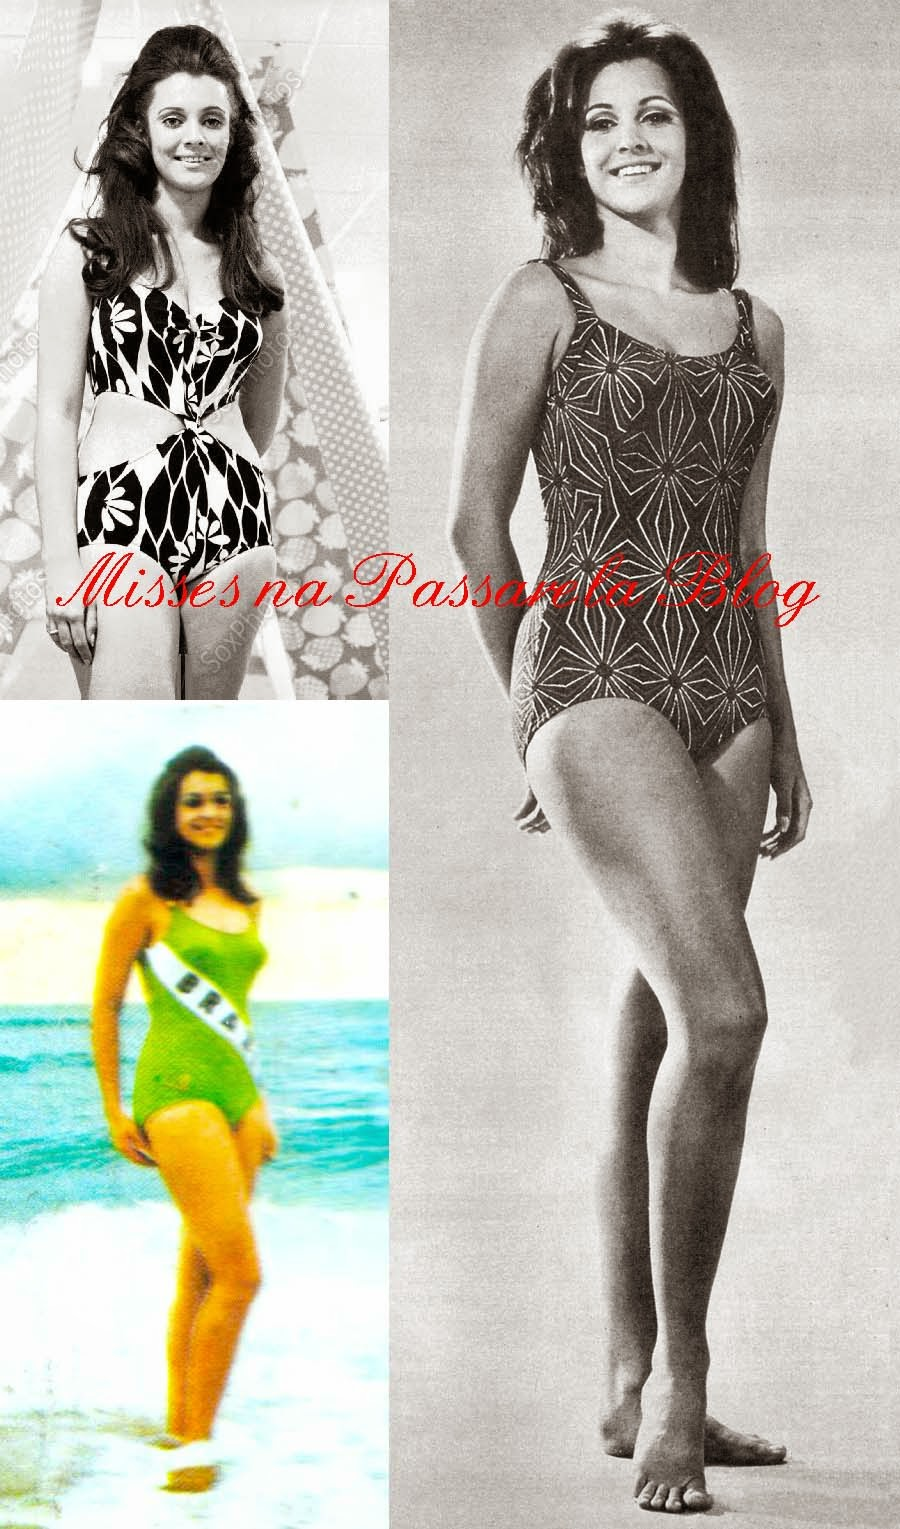 ☽ ✮ ✯ ✰ ☆ ☁ Galeria de Martha Vasconcelos, Miss Universe 1968.☽ ✮ ✯ ✰ ☆ ☁ Livro%2Bde%2BMartha%2BVasconcellos%2B1